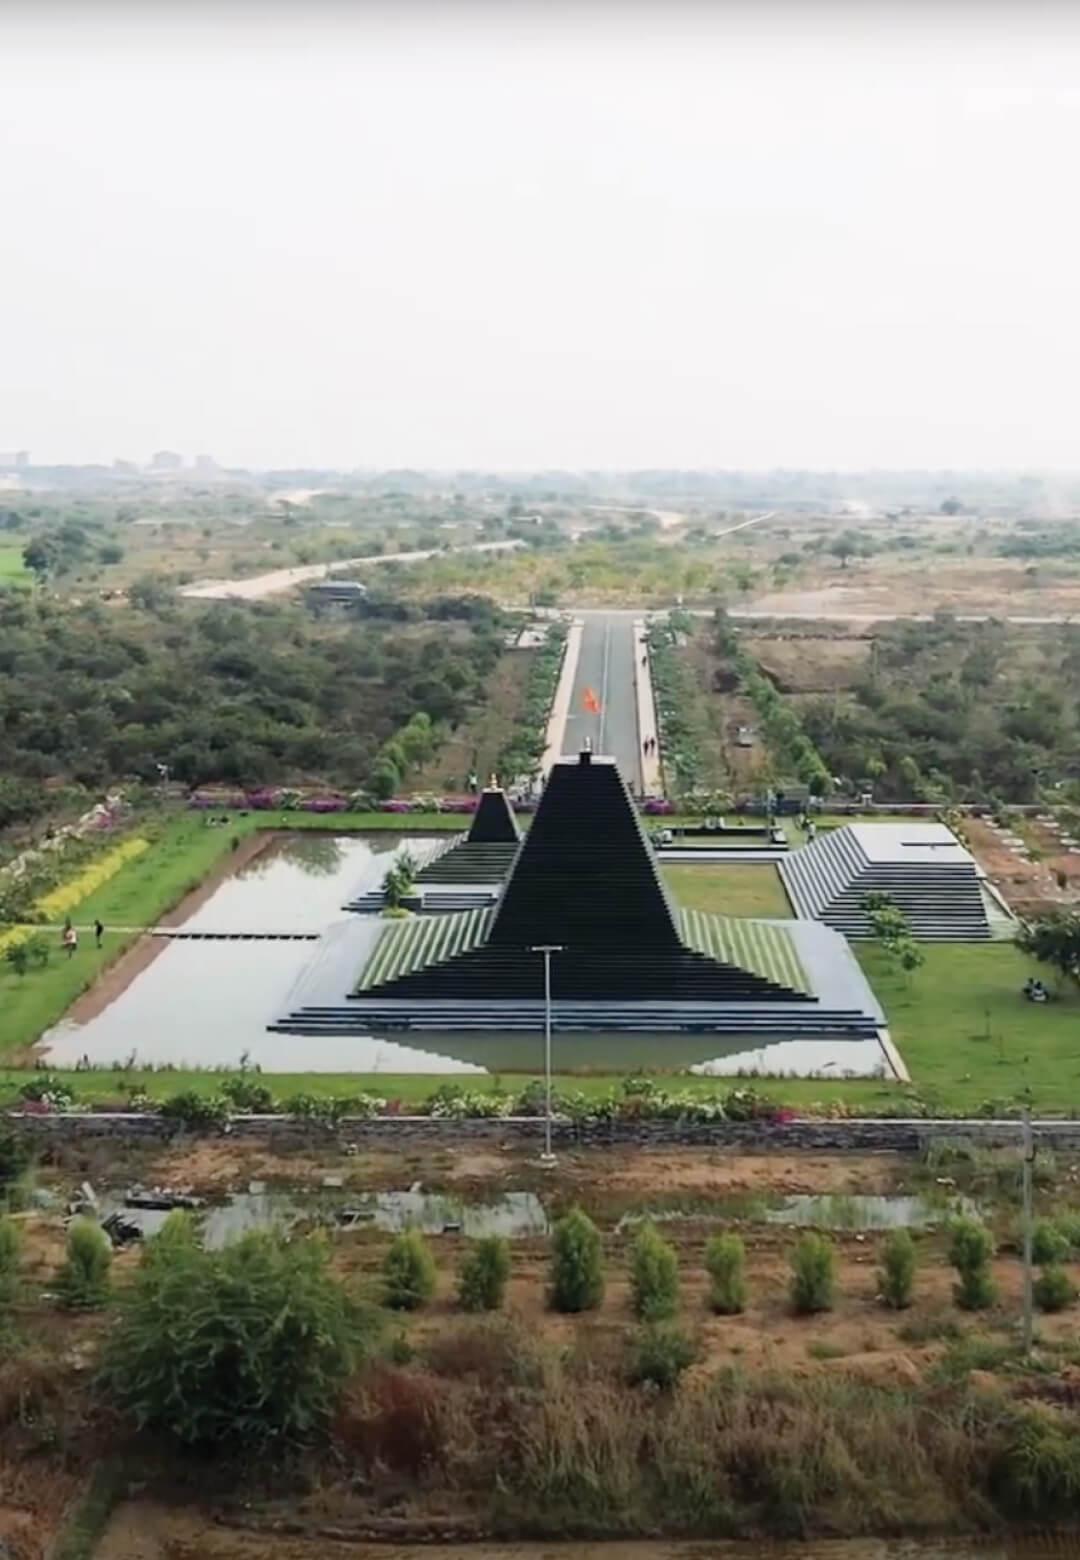 Temple of Steps designed by Sameep Padora and Associates in Nandyal, Andhra Pradesh, India | Balaji Temple or Temple of Steps by Sameep Padora and Associates | STIRworld